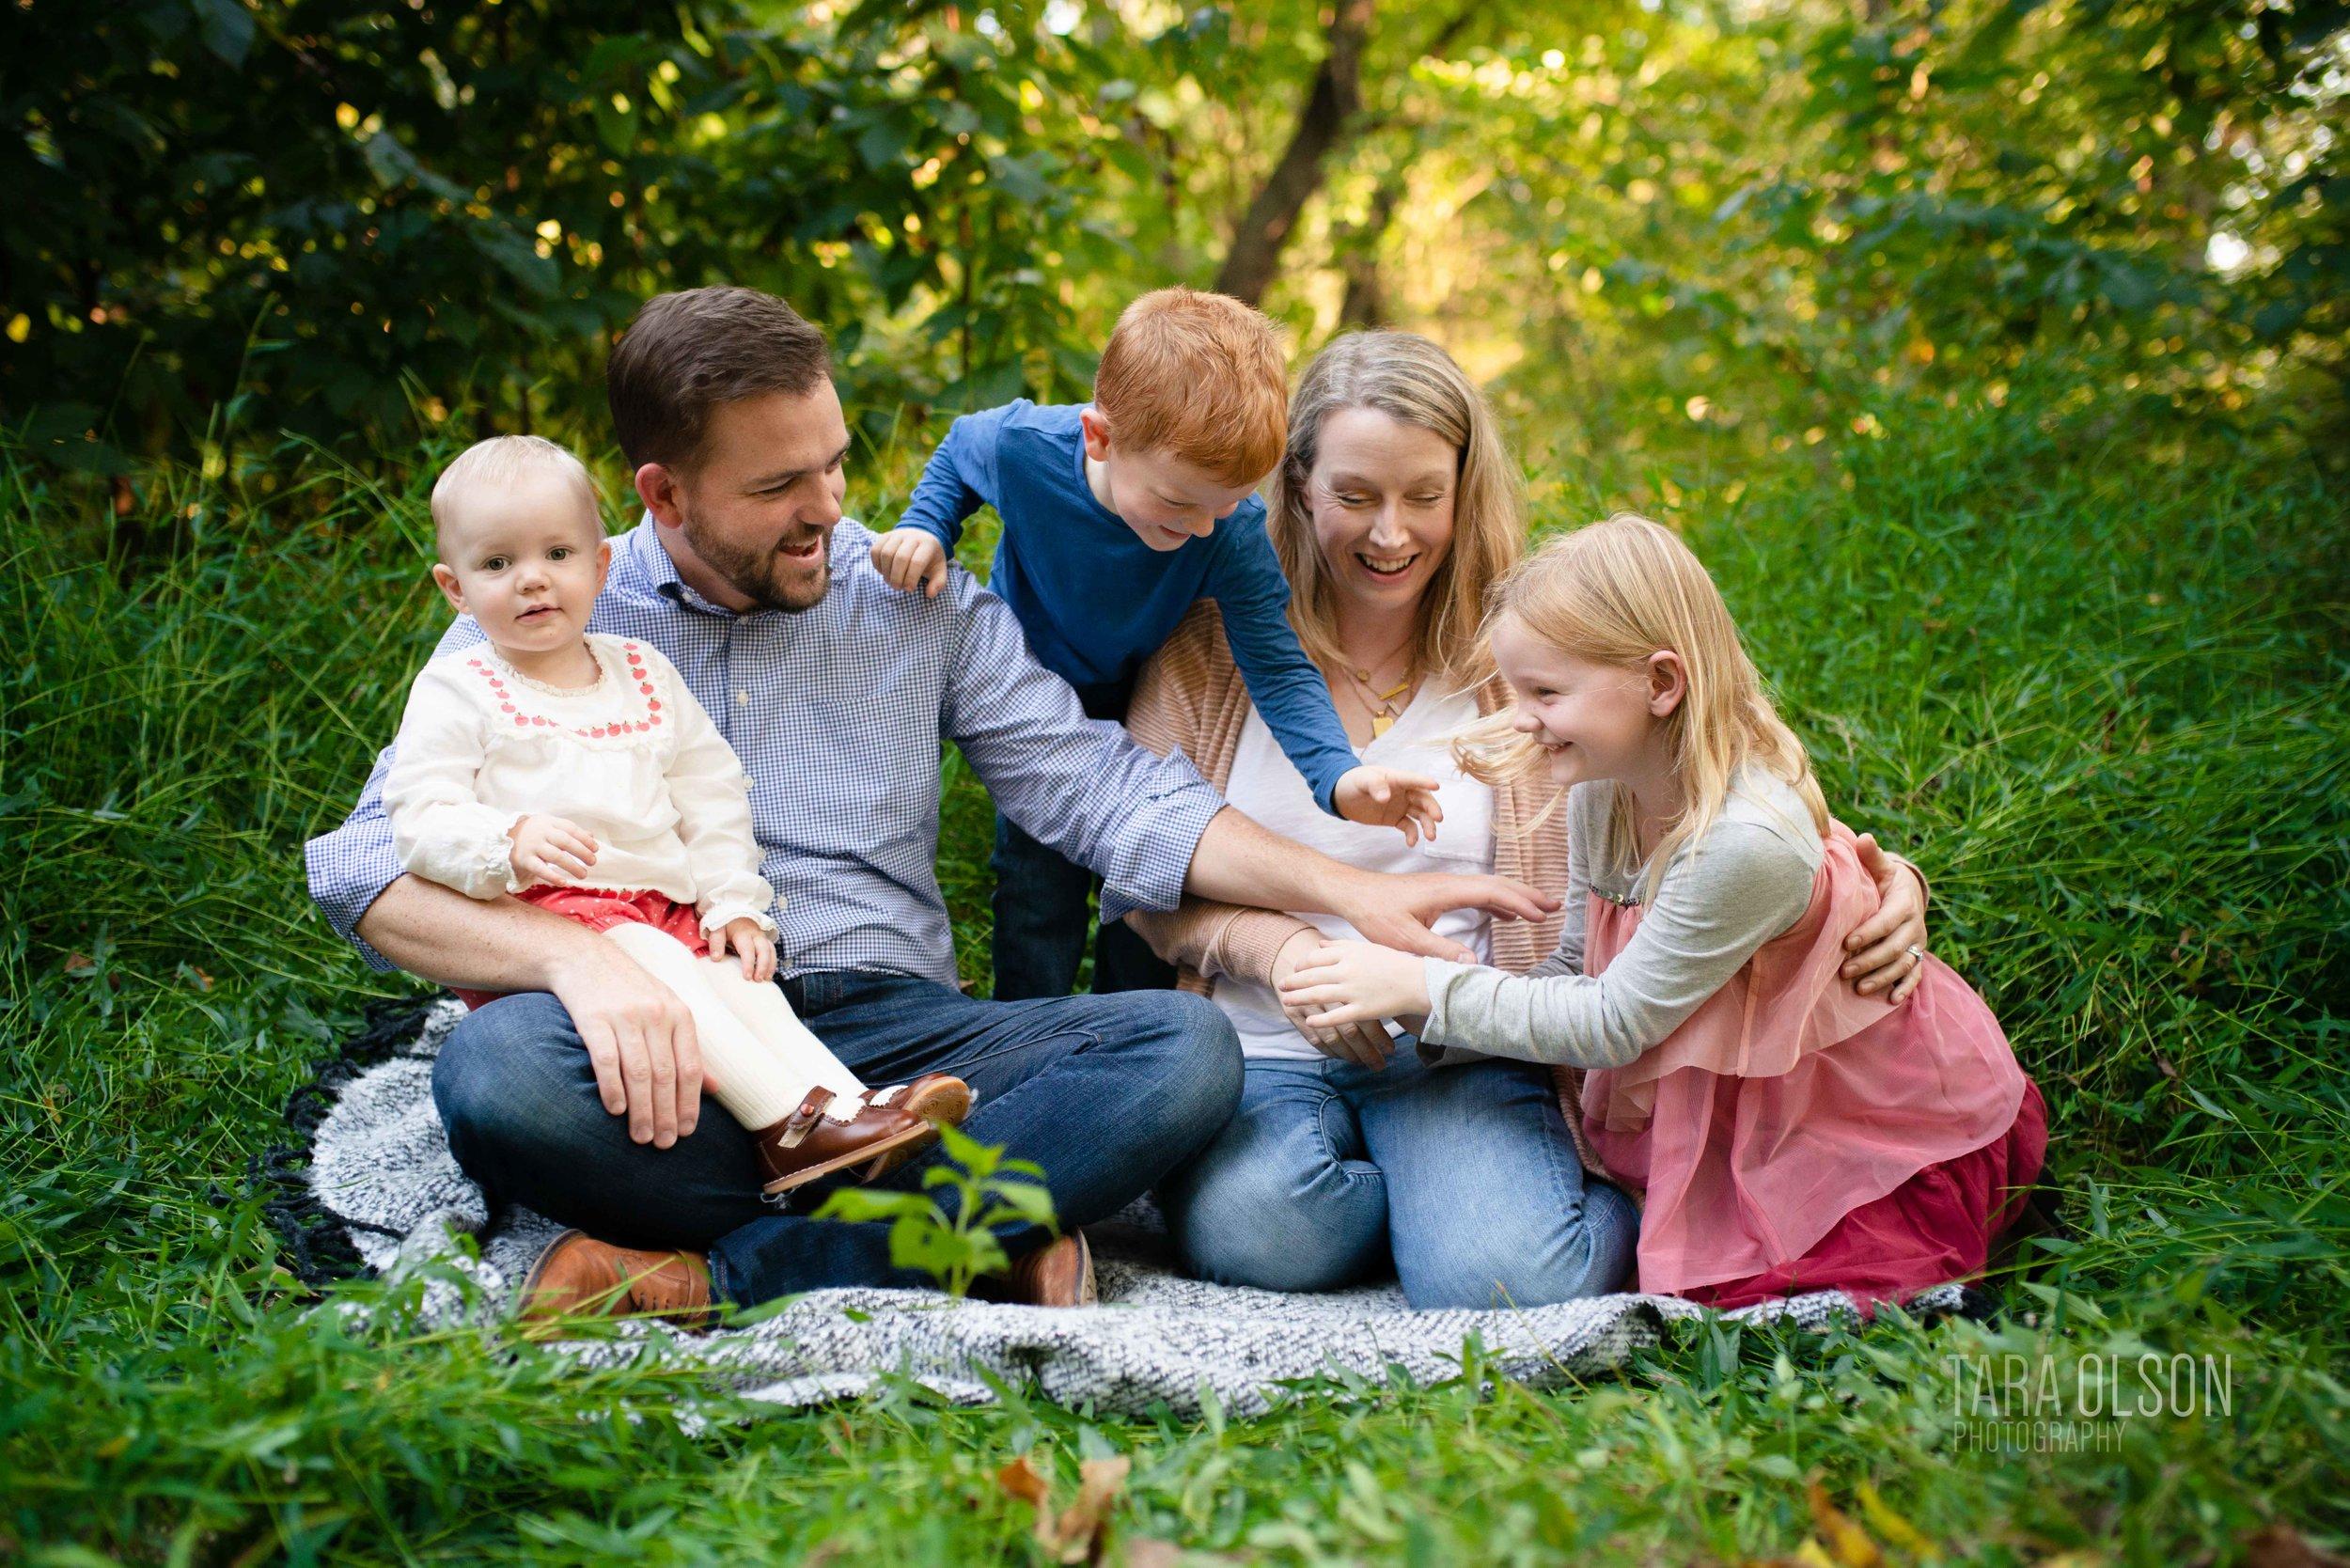 Hawkins_Arlington-Virginia-Family-Photographer_Tara-Olson-Photography_4071.jpg